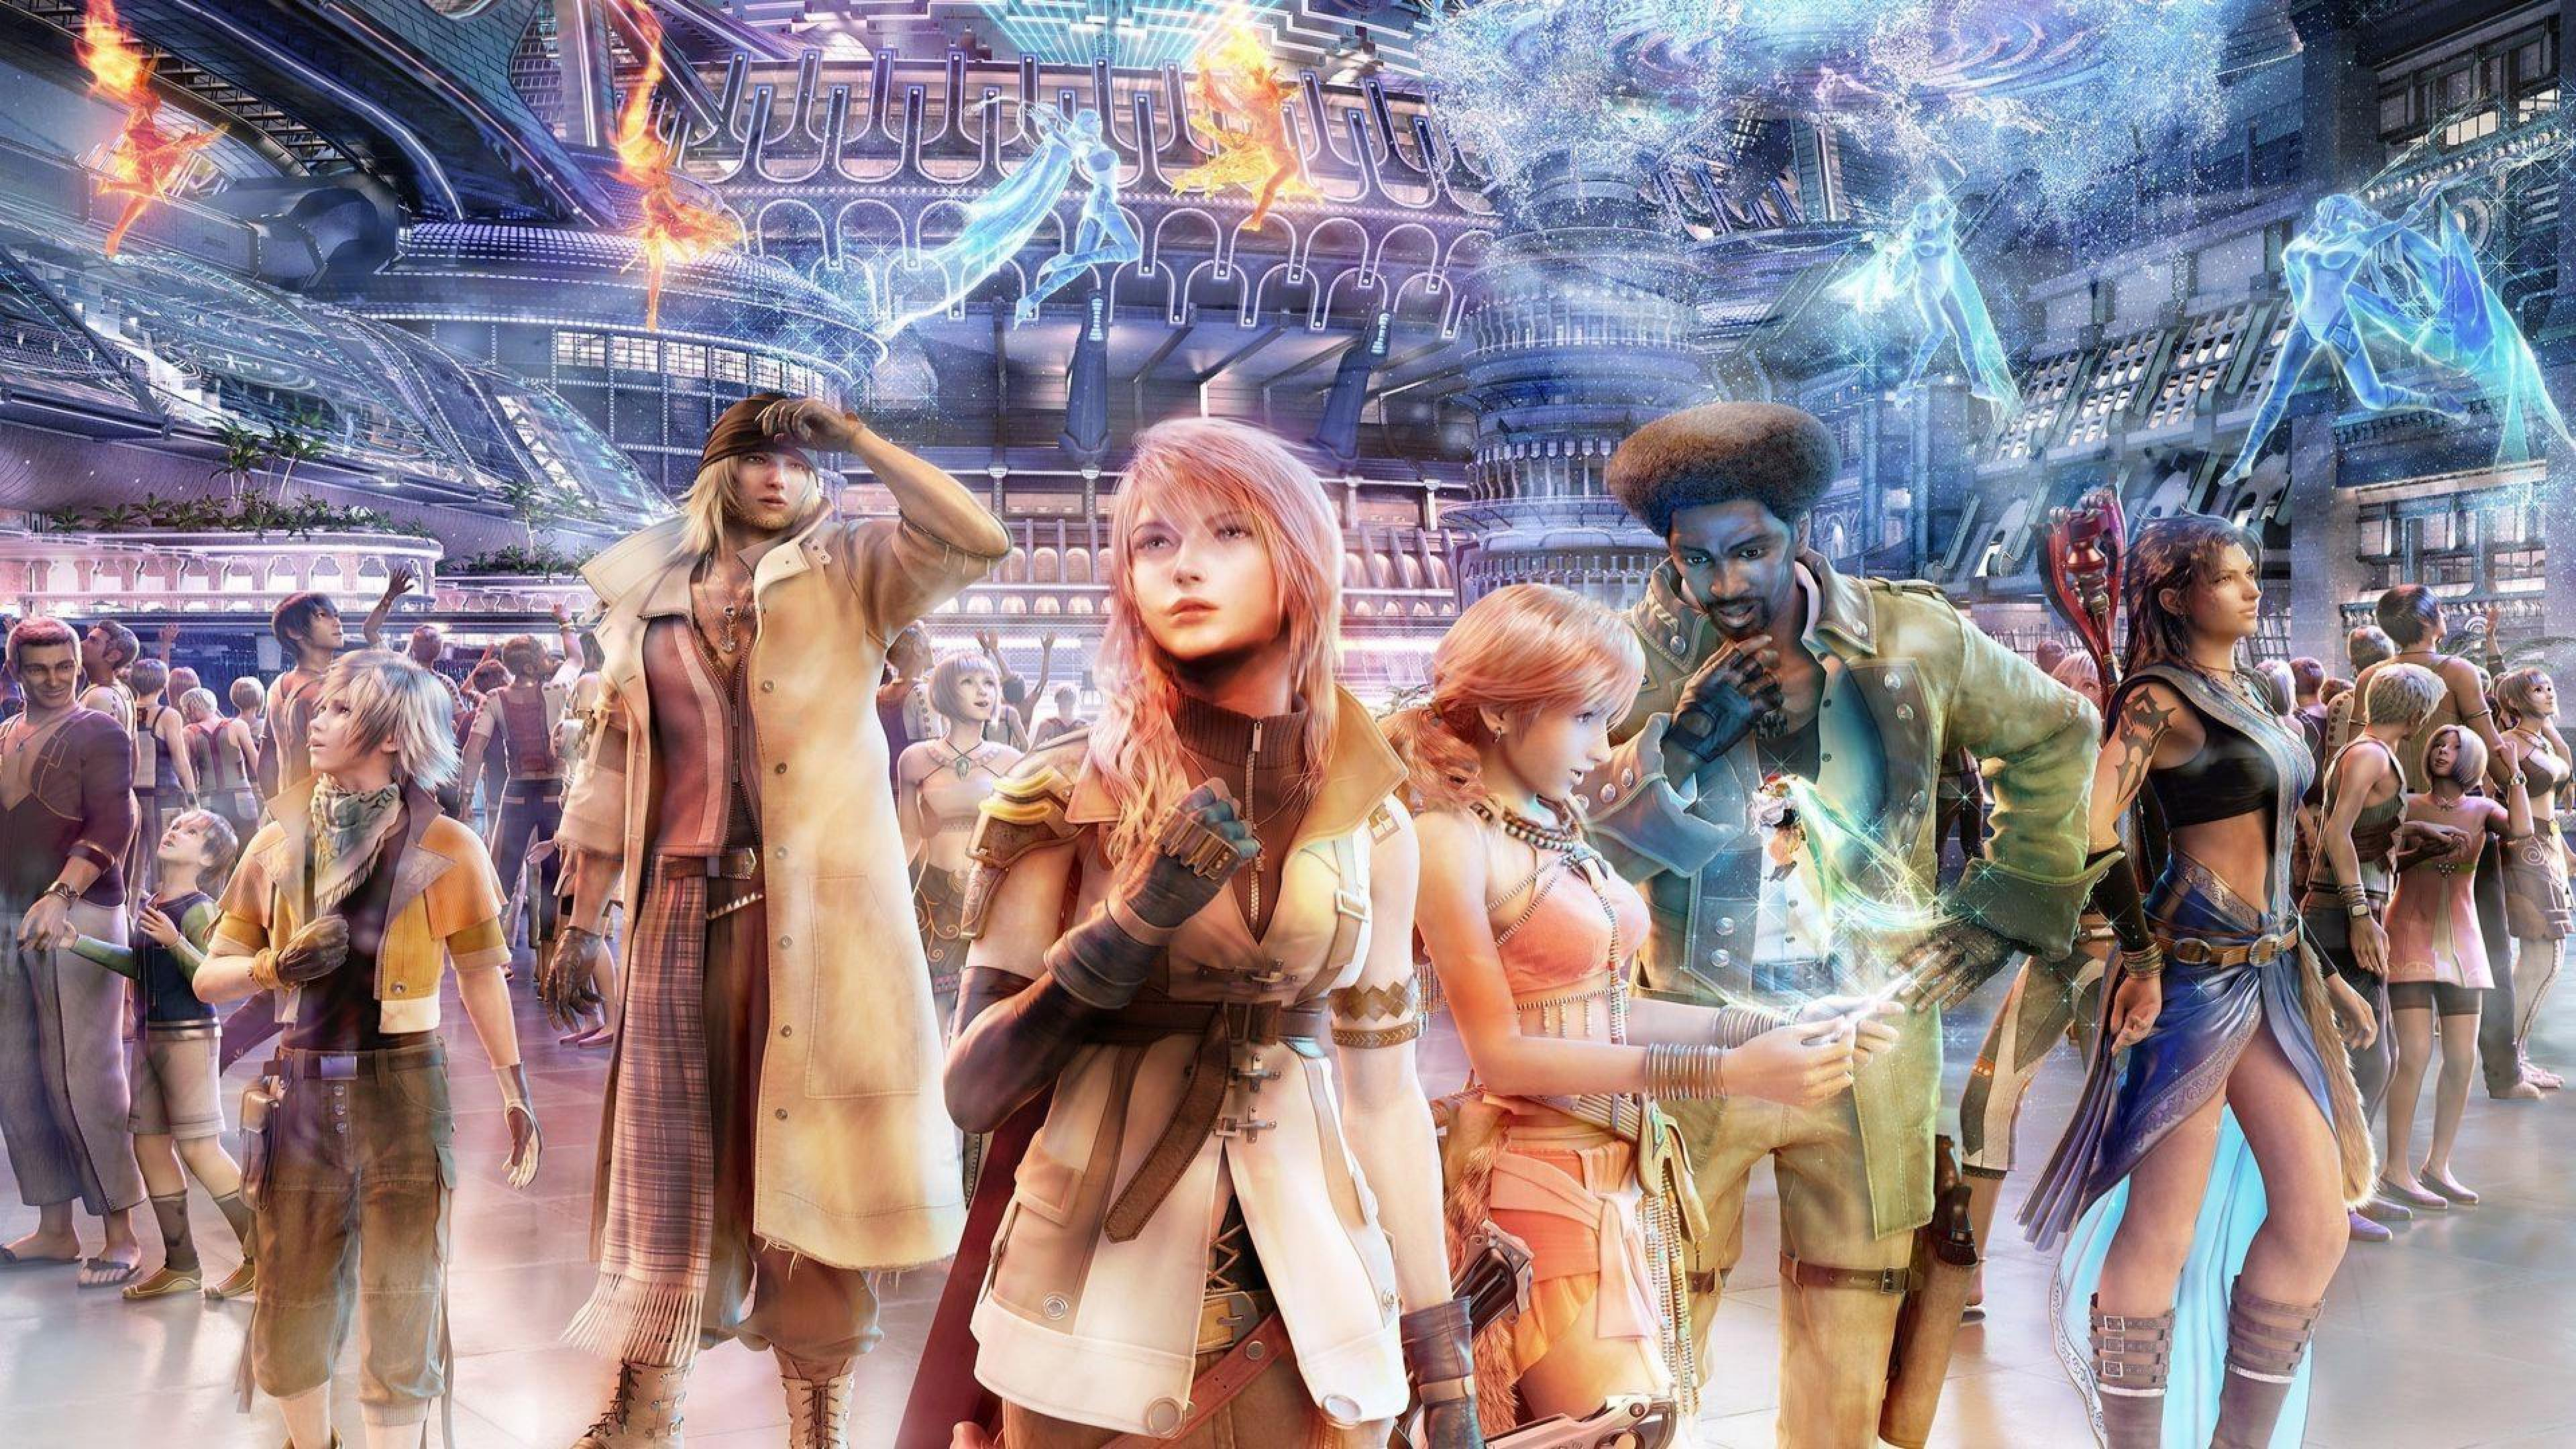 Final Fantasy Xiii XIII Games HD Wallpapers Desktop Src